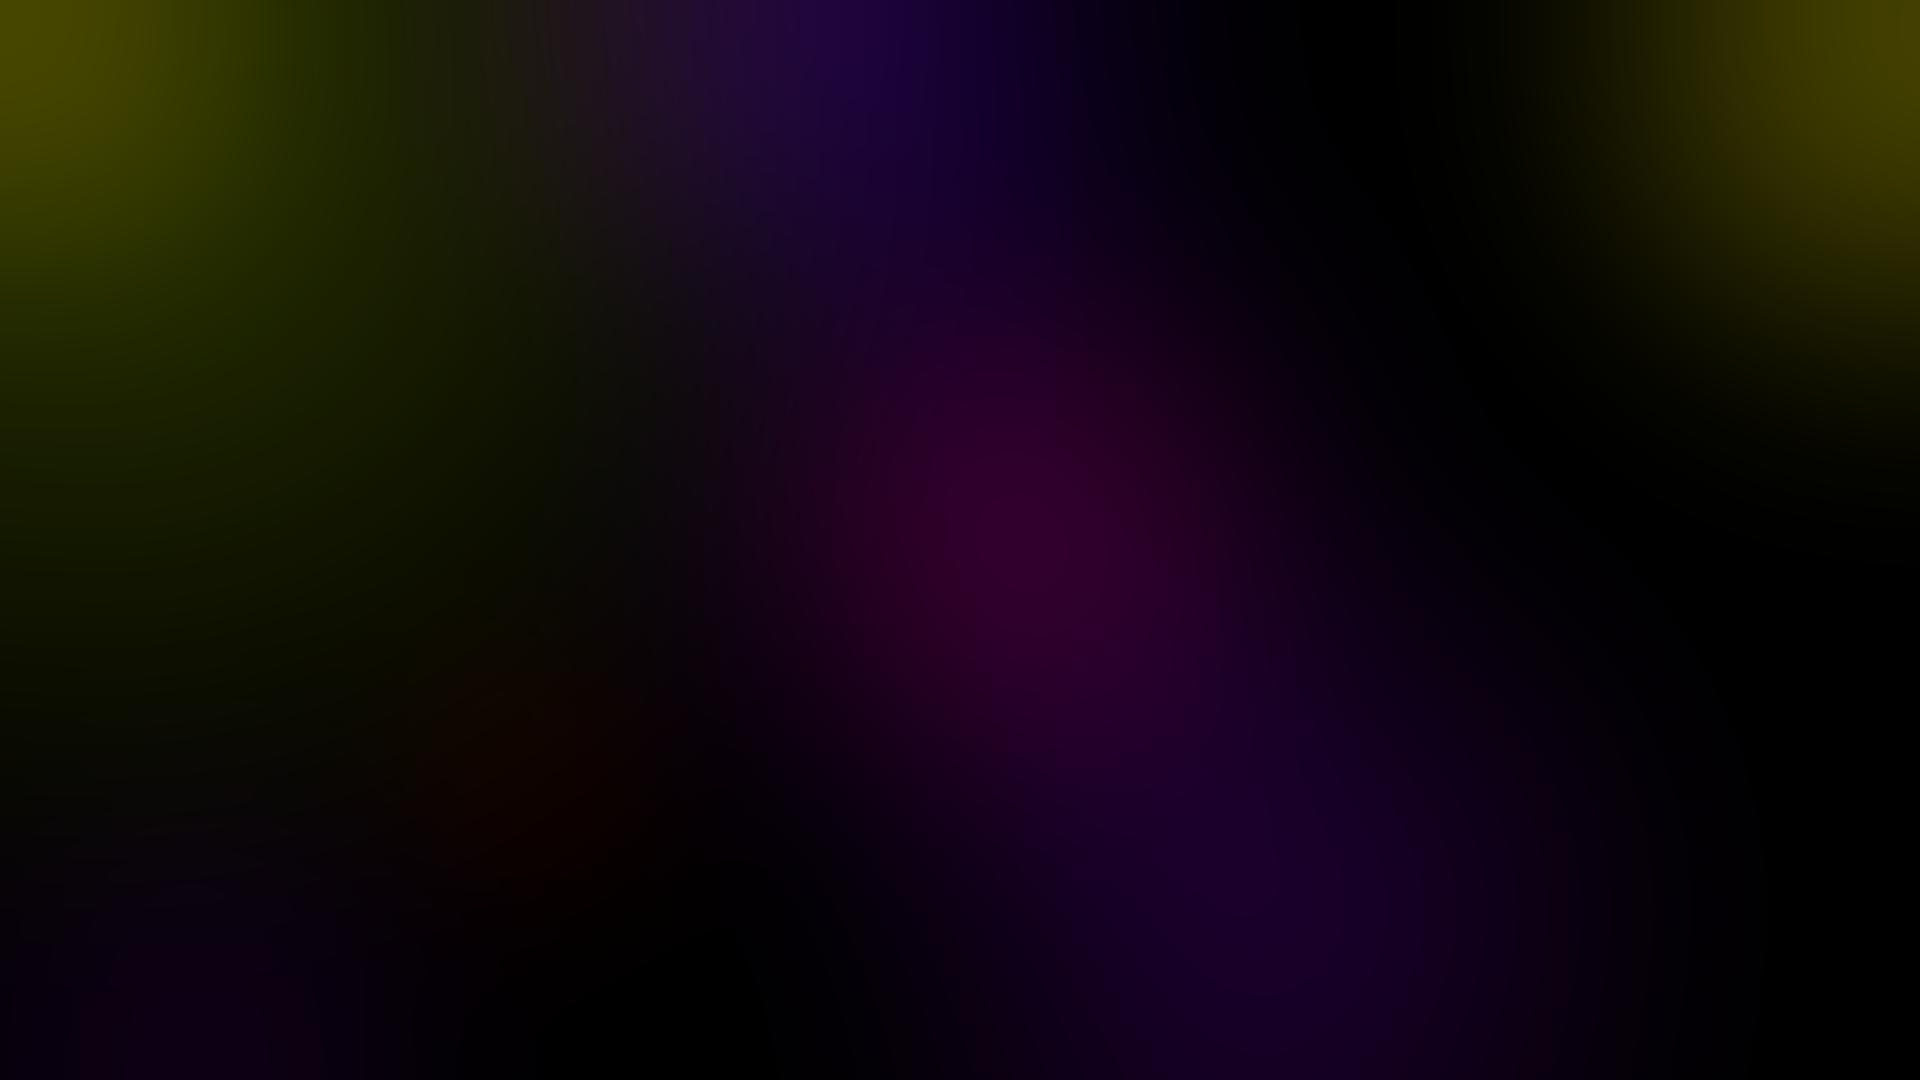 Lights on Black Background 1920x1080